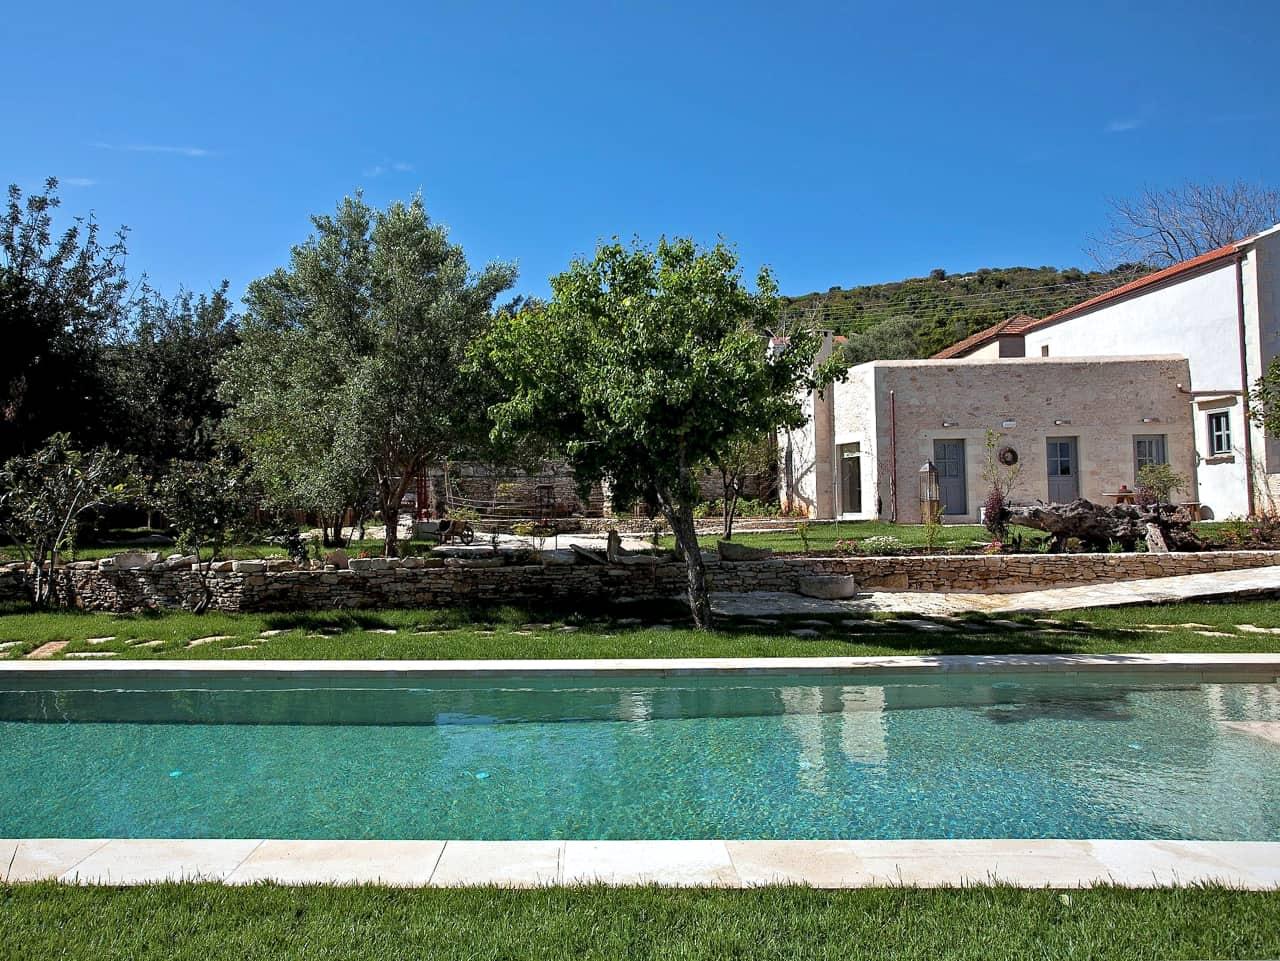 Villa Athermigo And The Journey Begins